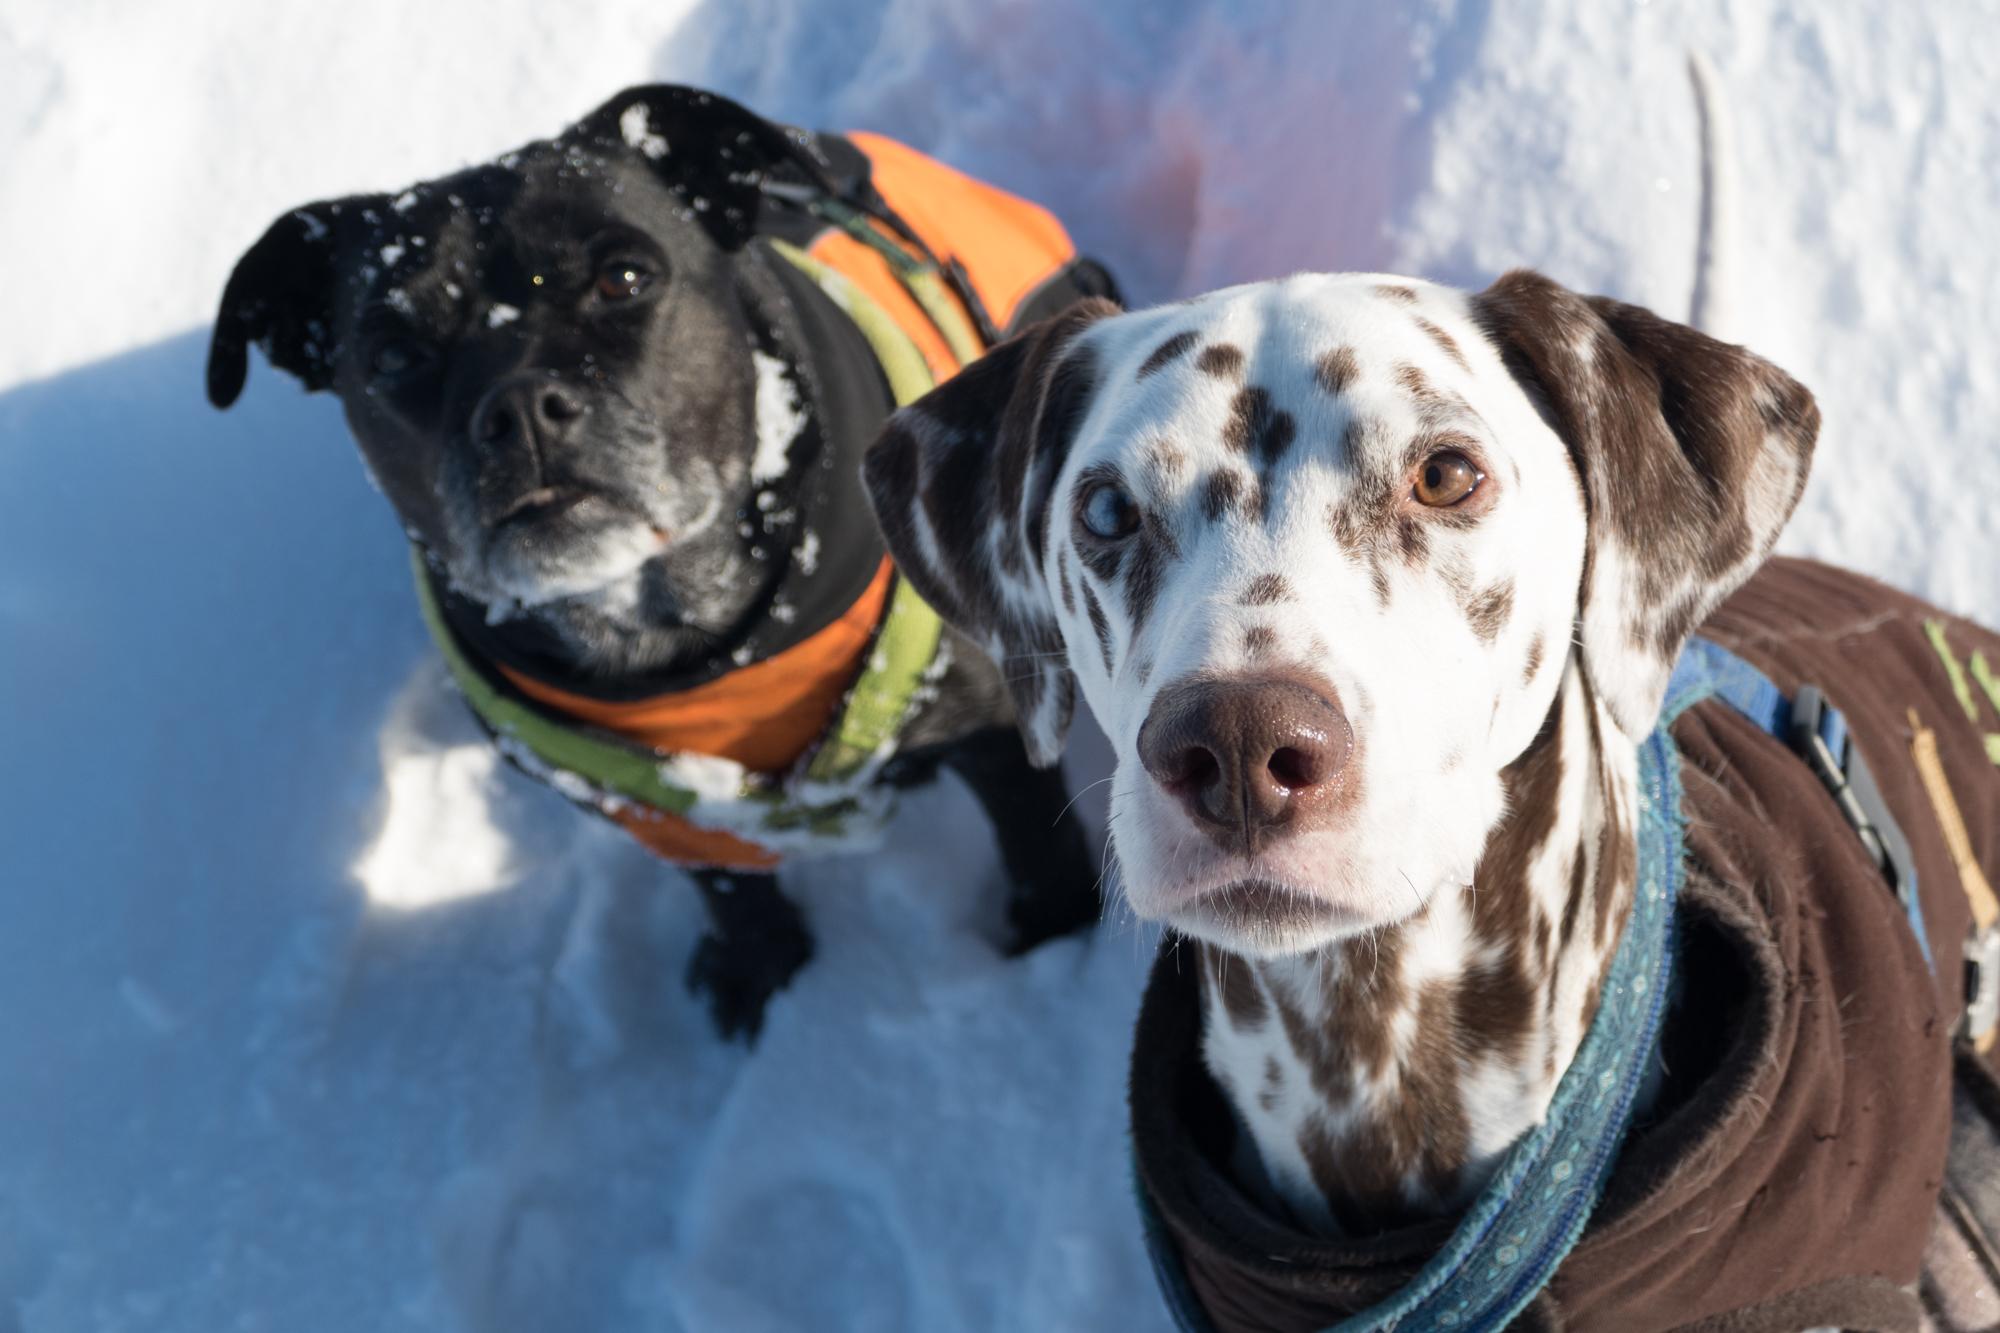 Hundemantel Zauberhunde Carnivorus Hundephysiotherapie Tierheilpraxis